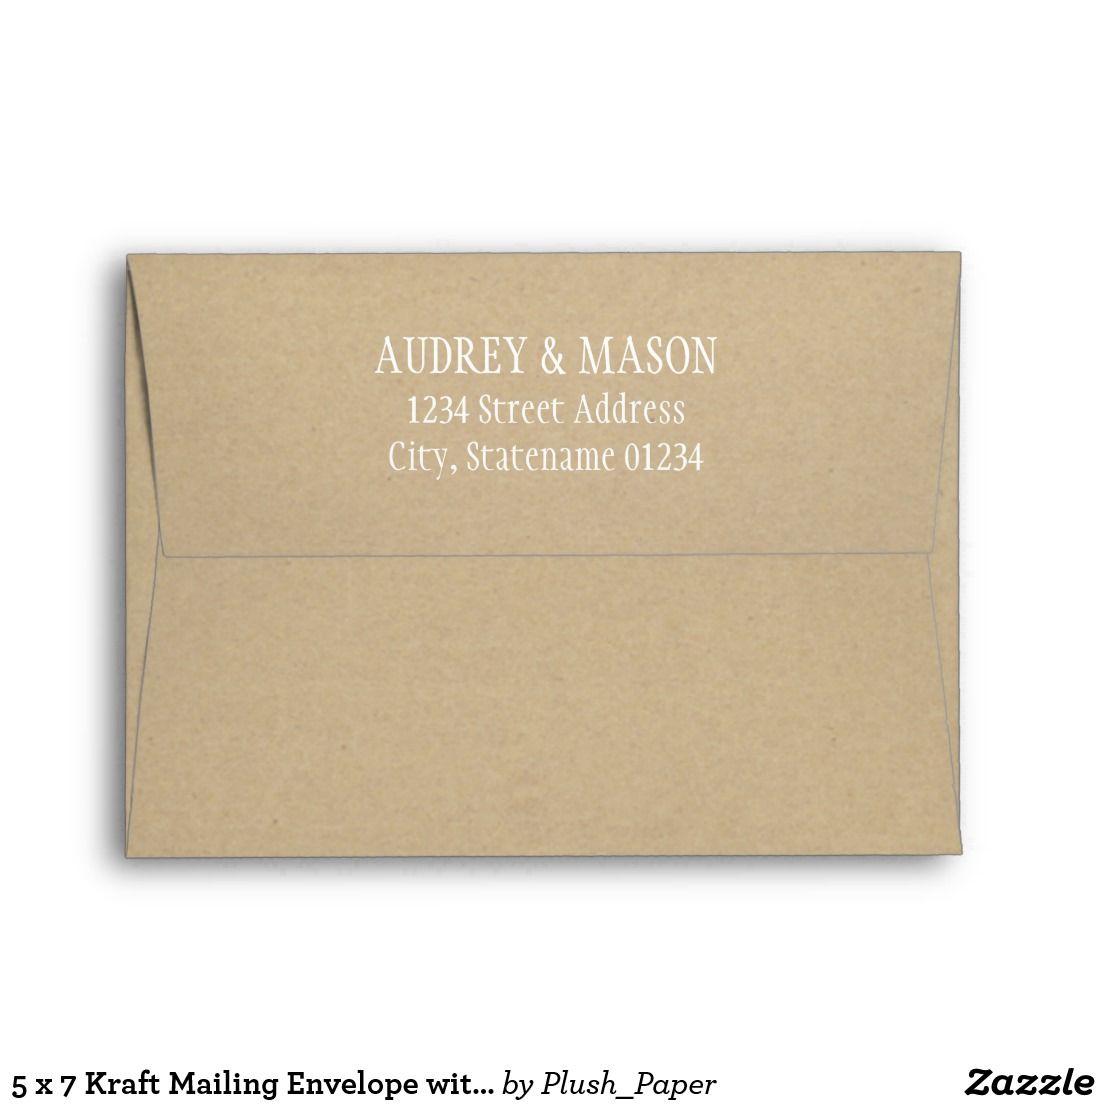 5 x 7 kraft mailing envelope with return addresscustom a7 wedding